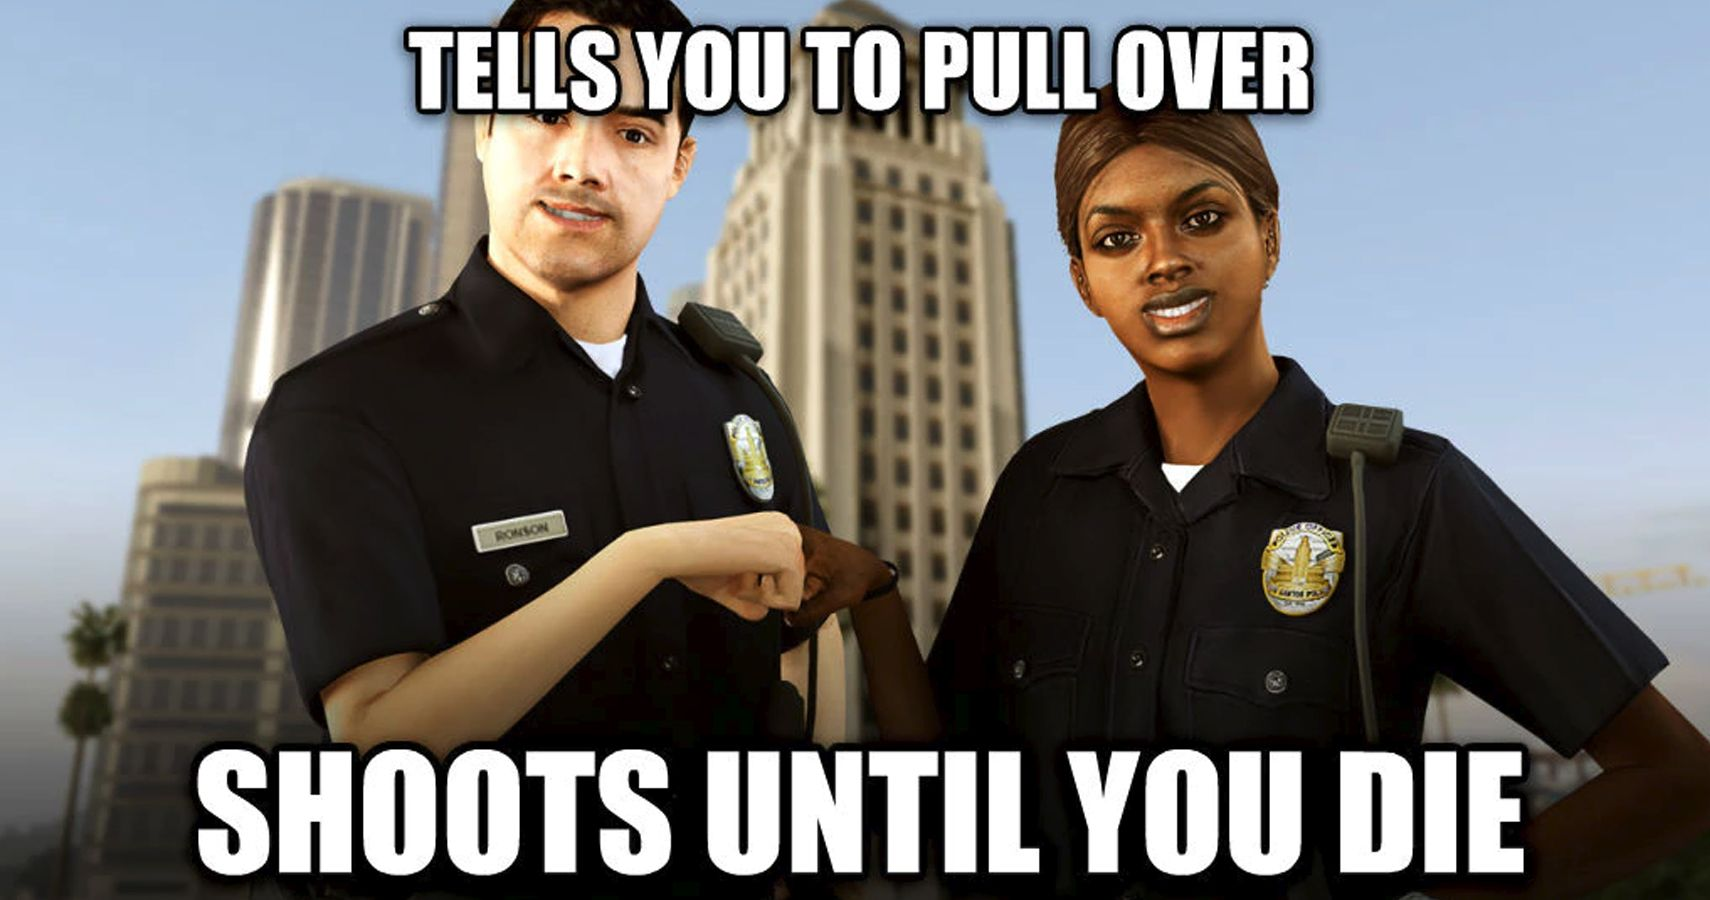 Funny Police Officer Meme : ✅ best memes about police police memes